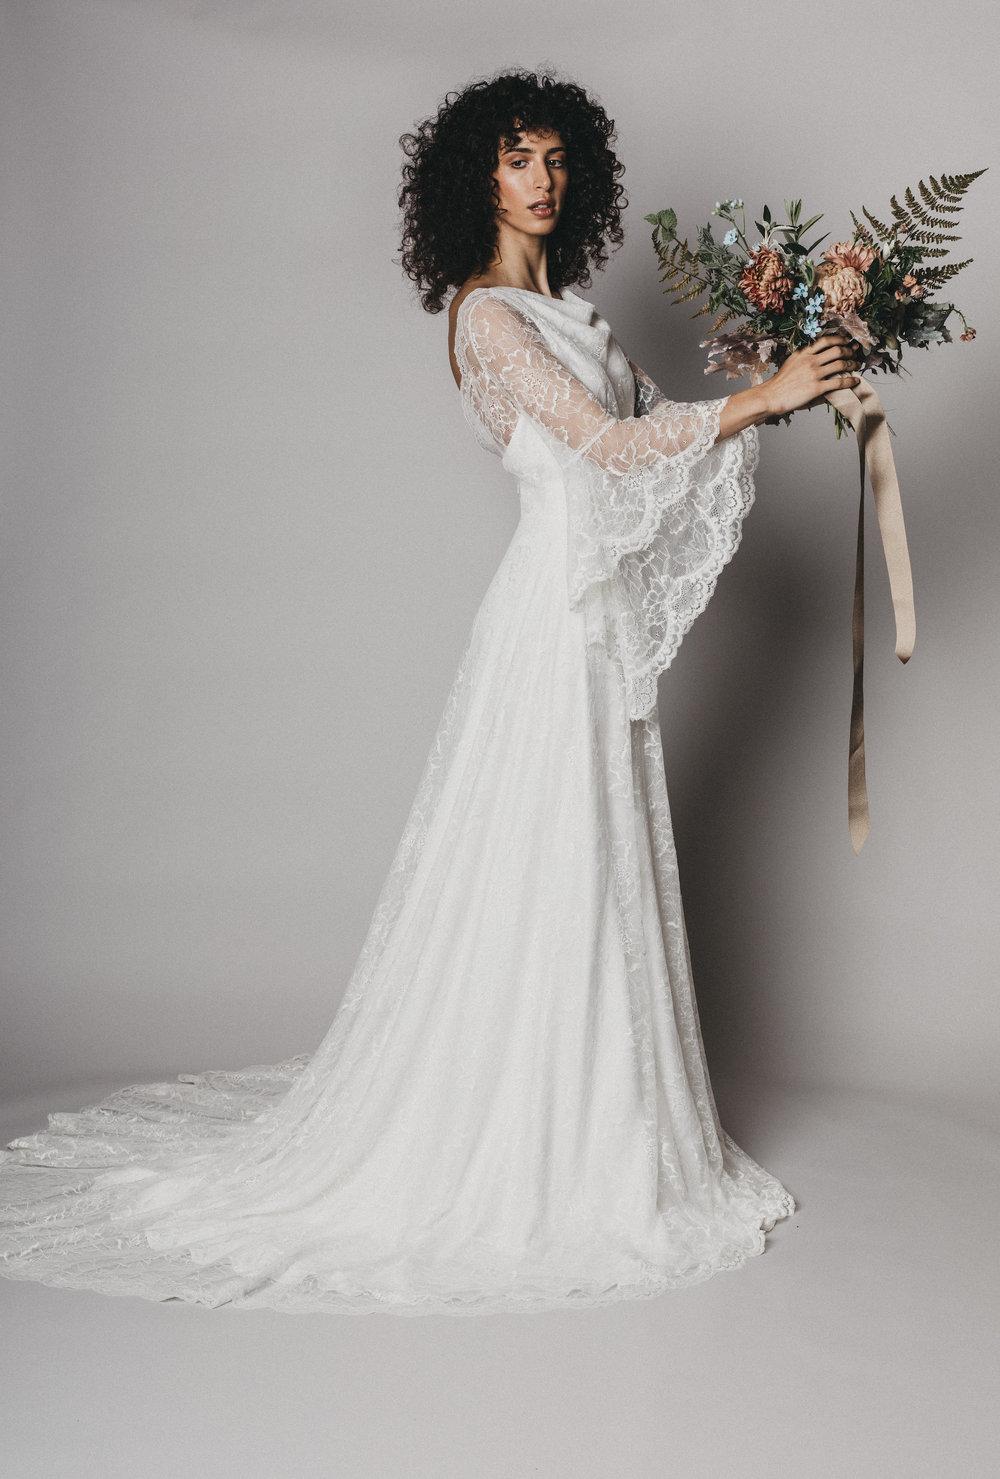 Rolling in Roses alternative wedding dress6.jpg